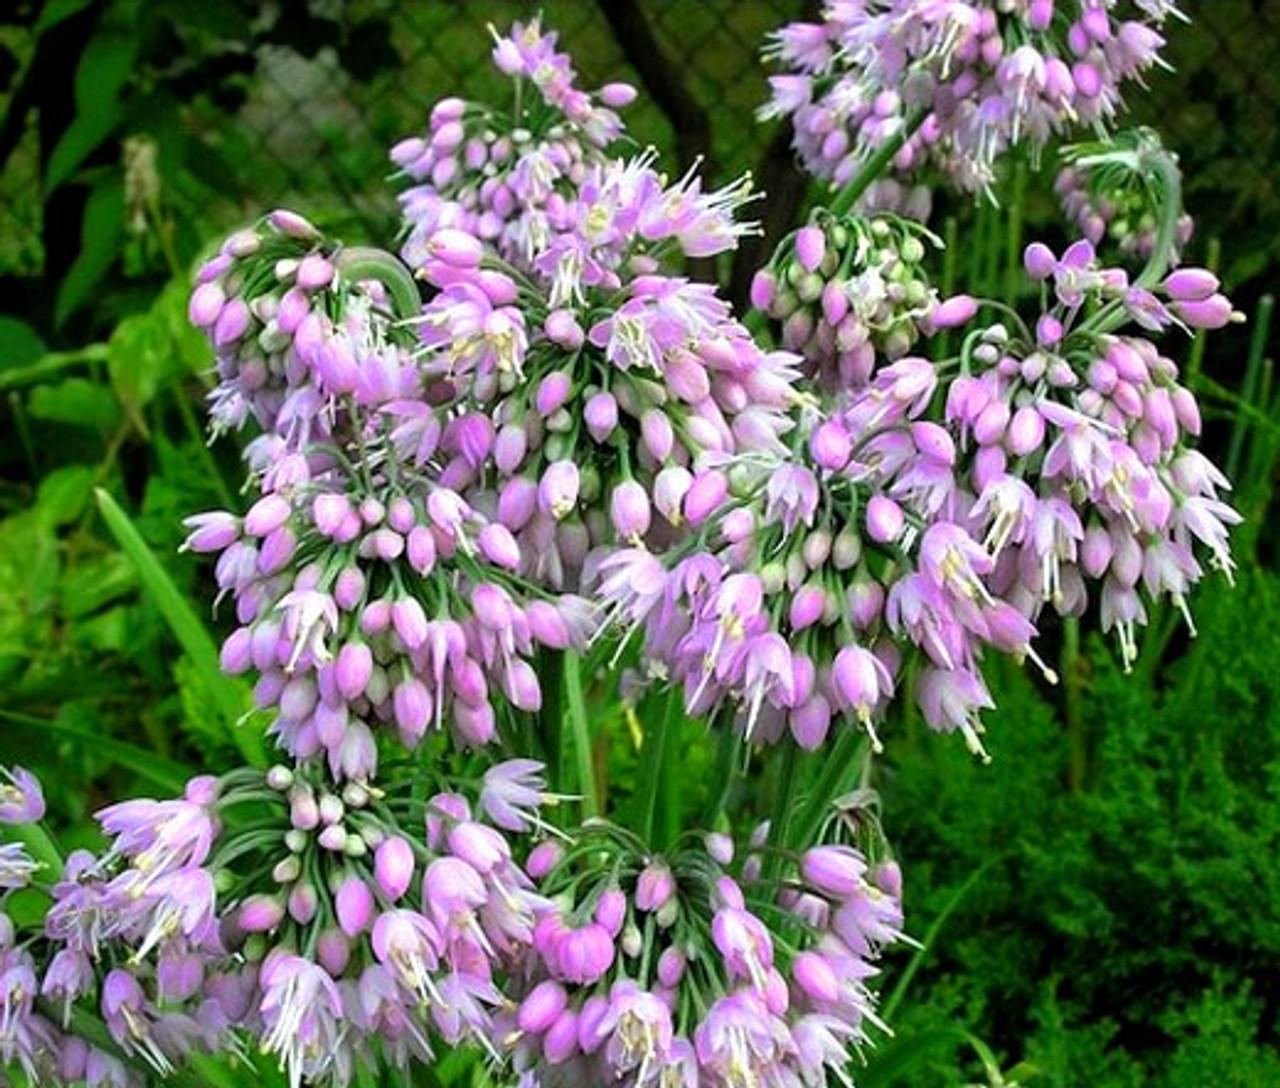 Allium Cernuum Flower Seeds